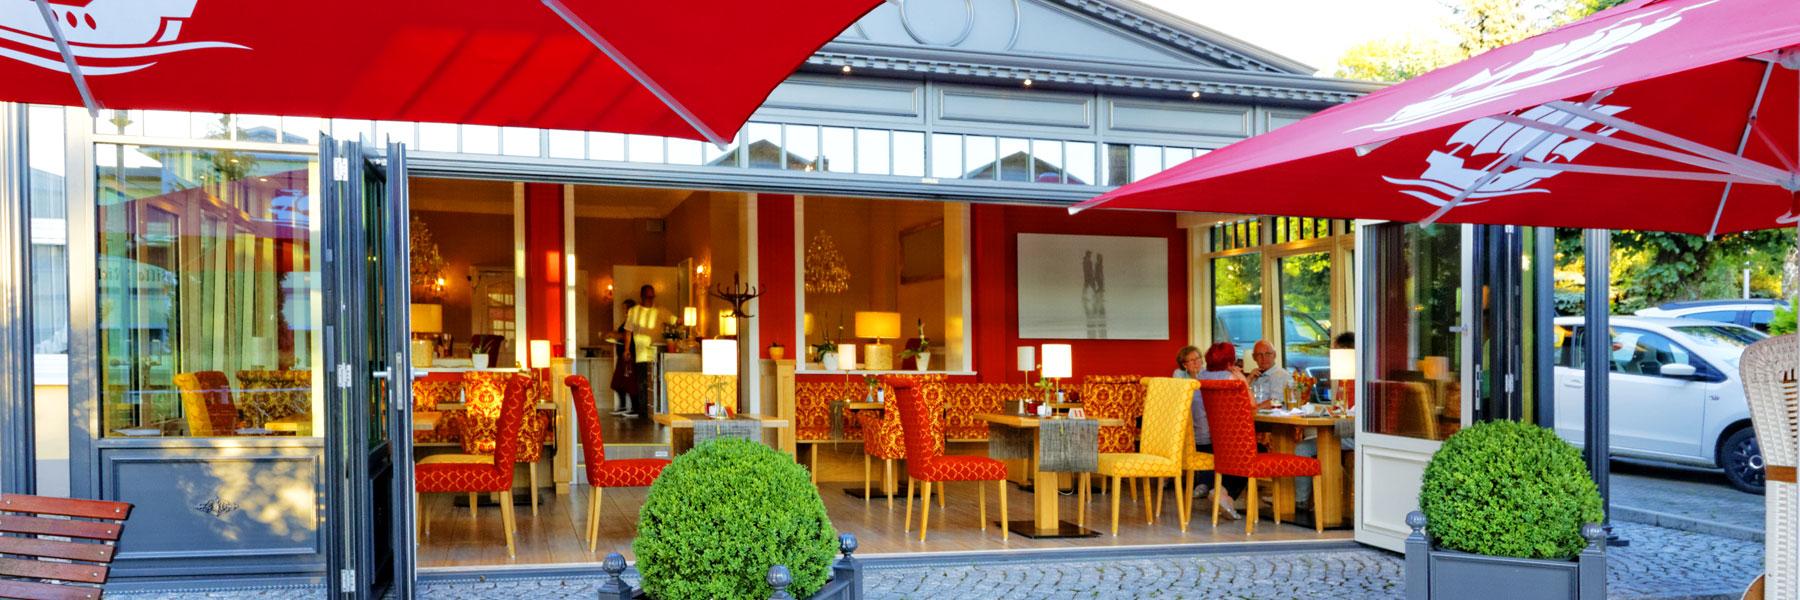 Wintergartenrestaurant - Hotel Sonneneck